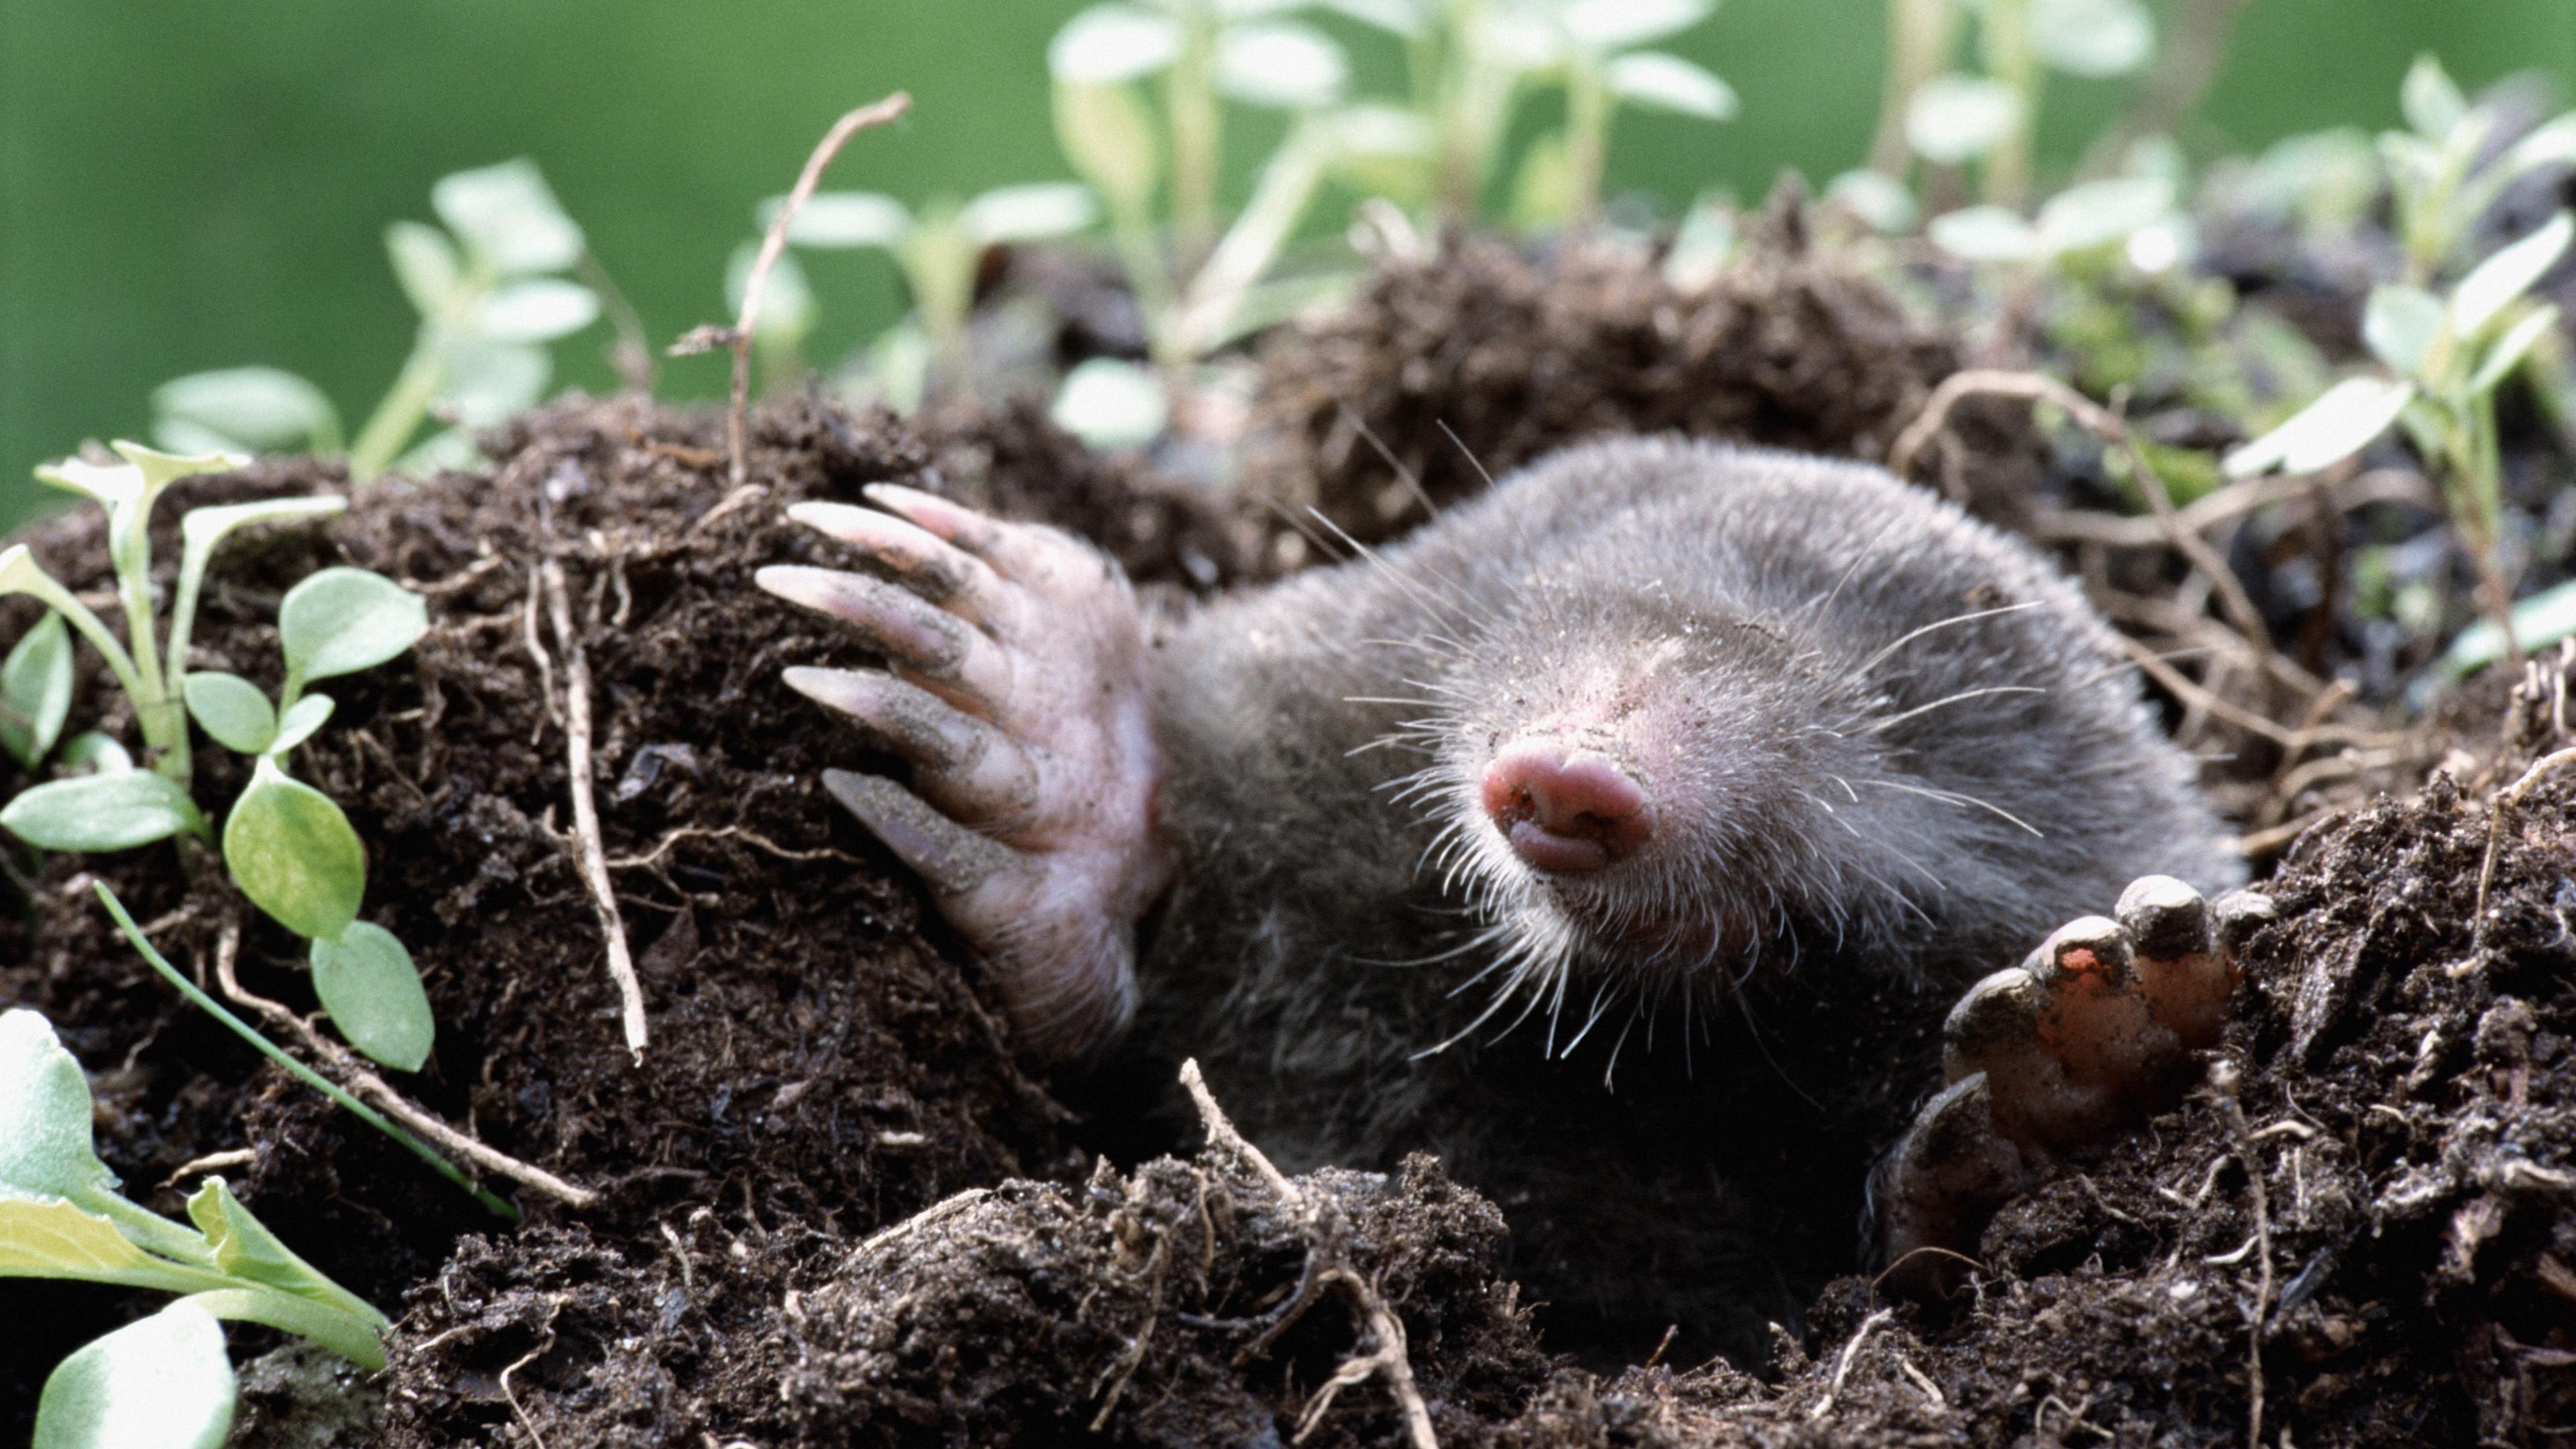 mole earth dirt grass hole 4k 1542242167 - mole, earth, dirt, grass, hole 4k - mole, Earth, Dirt